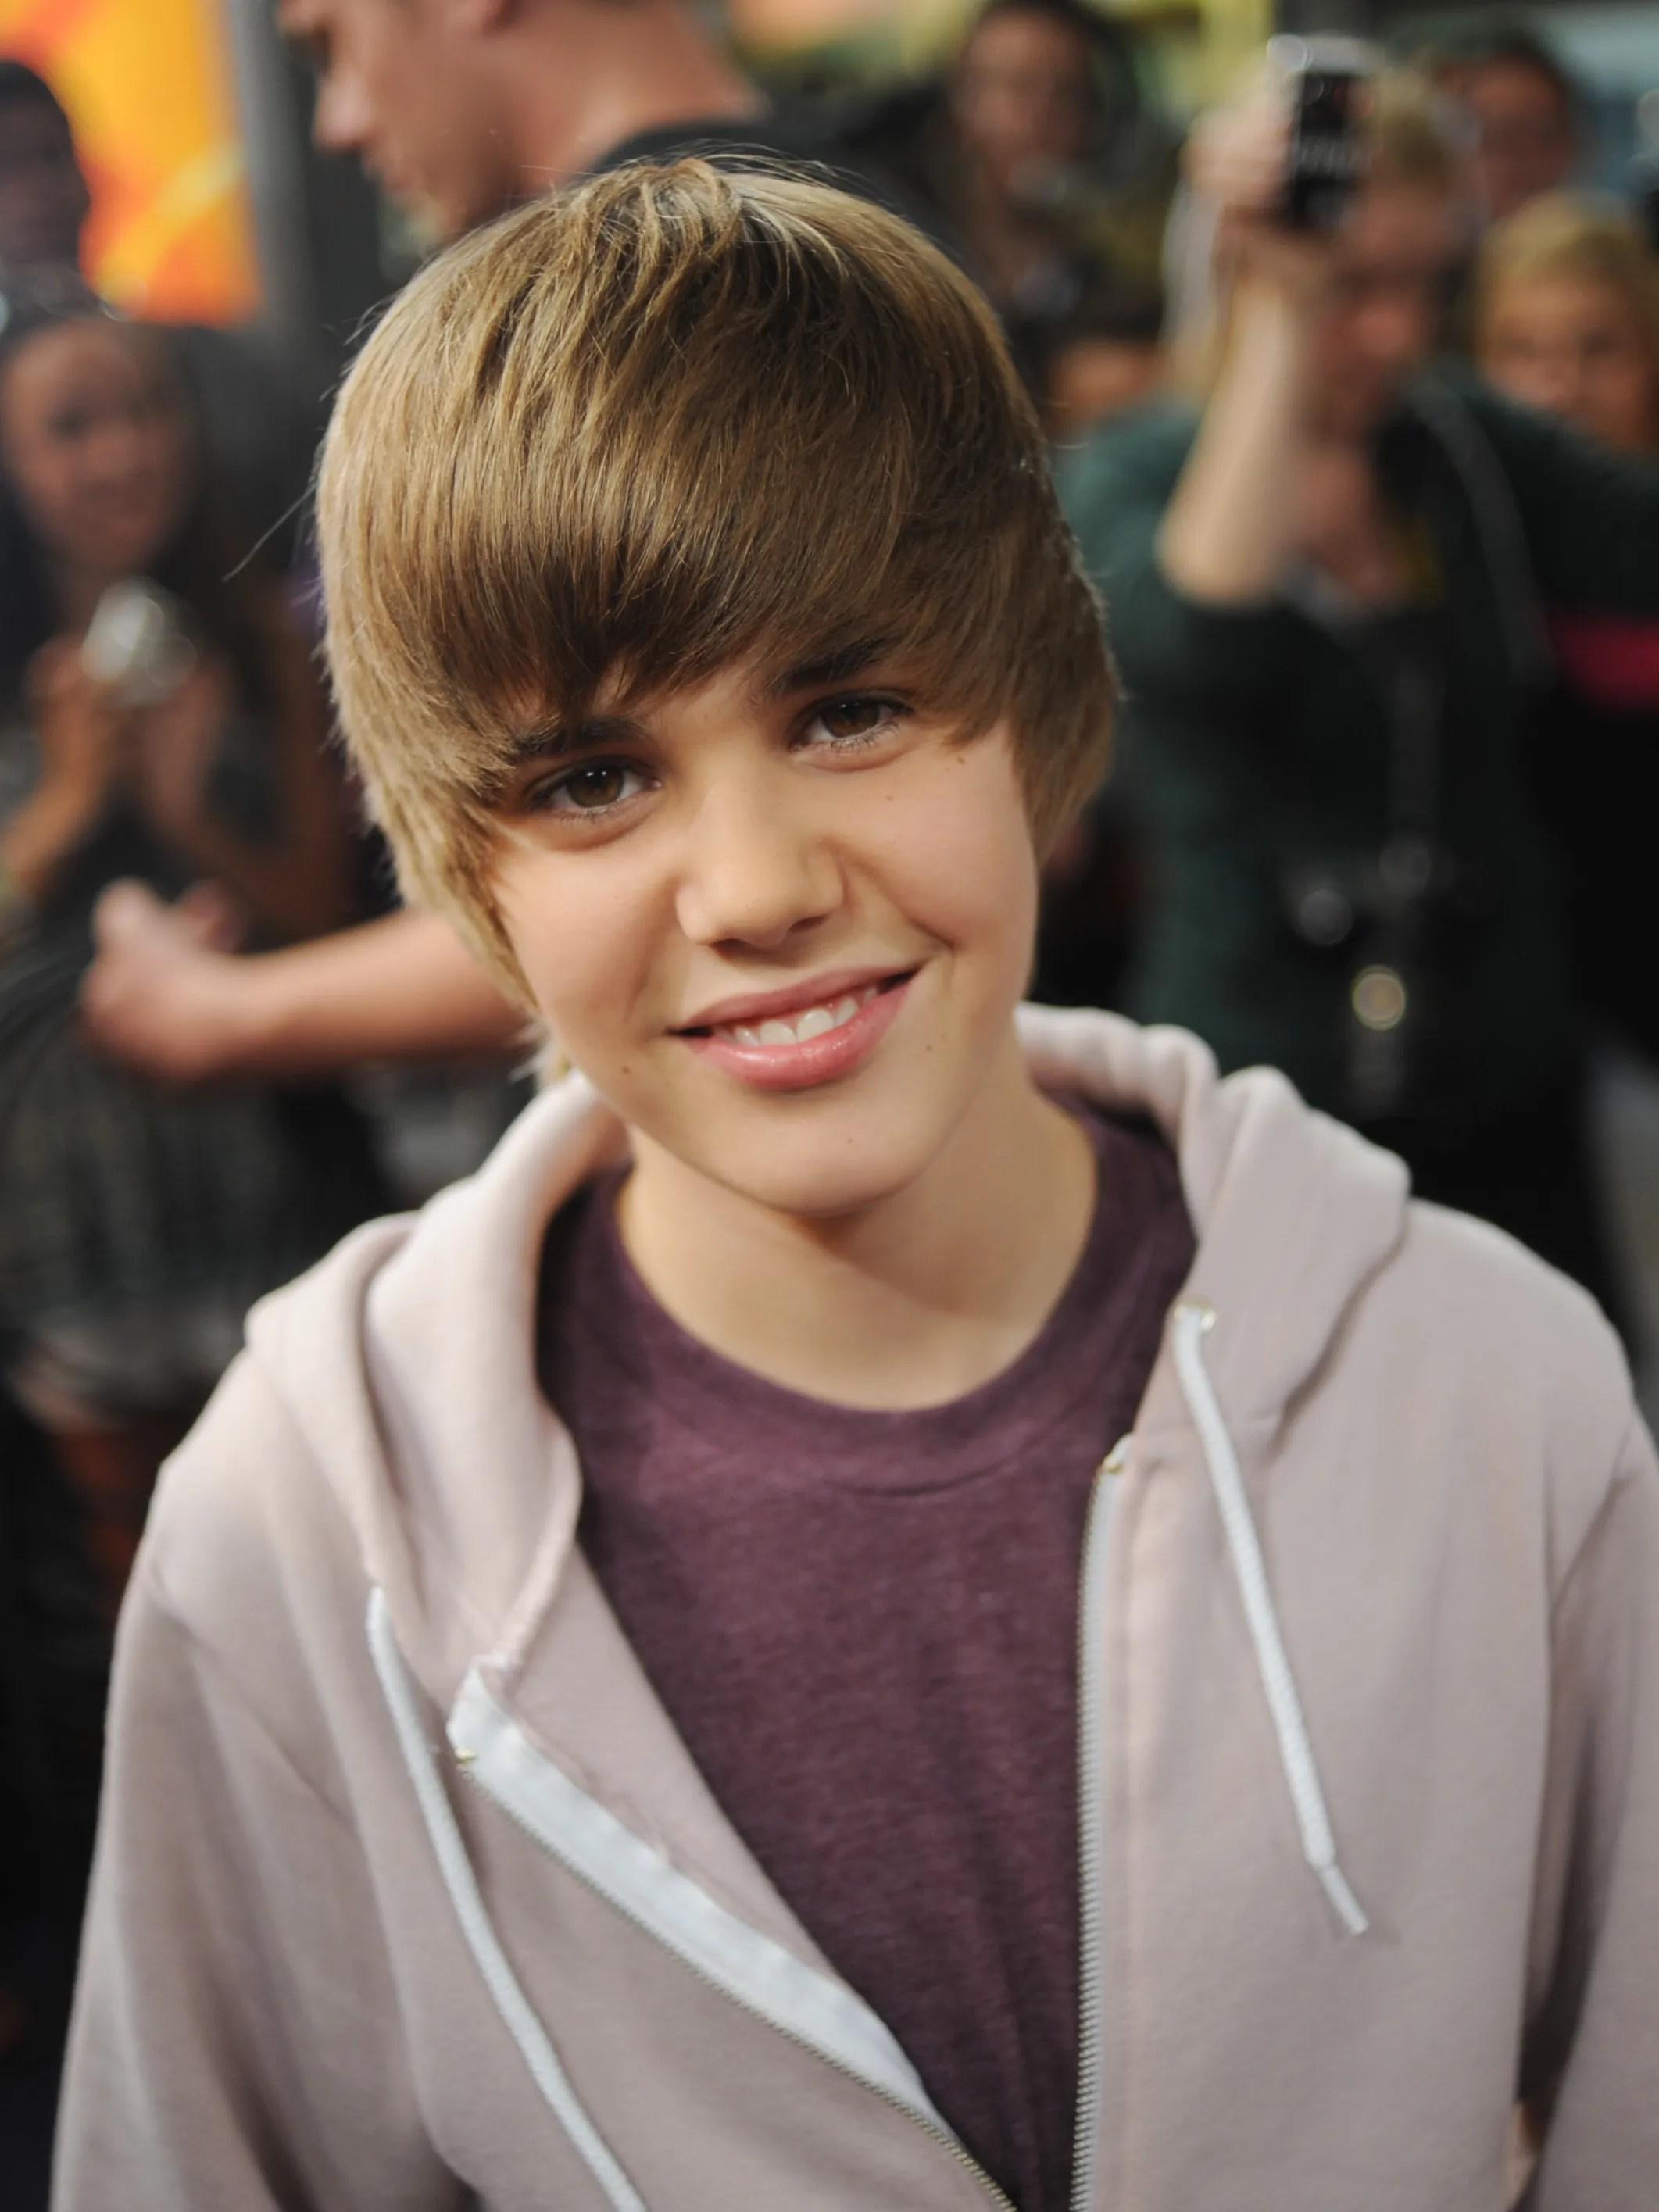 Justin Bieber Haircut + Hairstyle 2019 | Taperfadehaircut.com